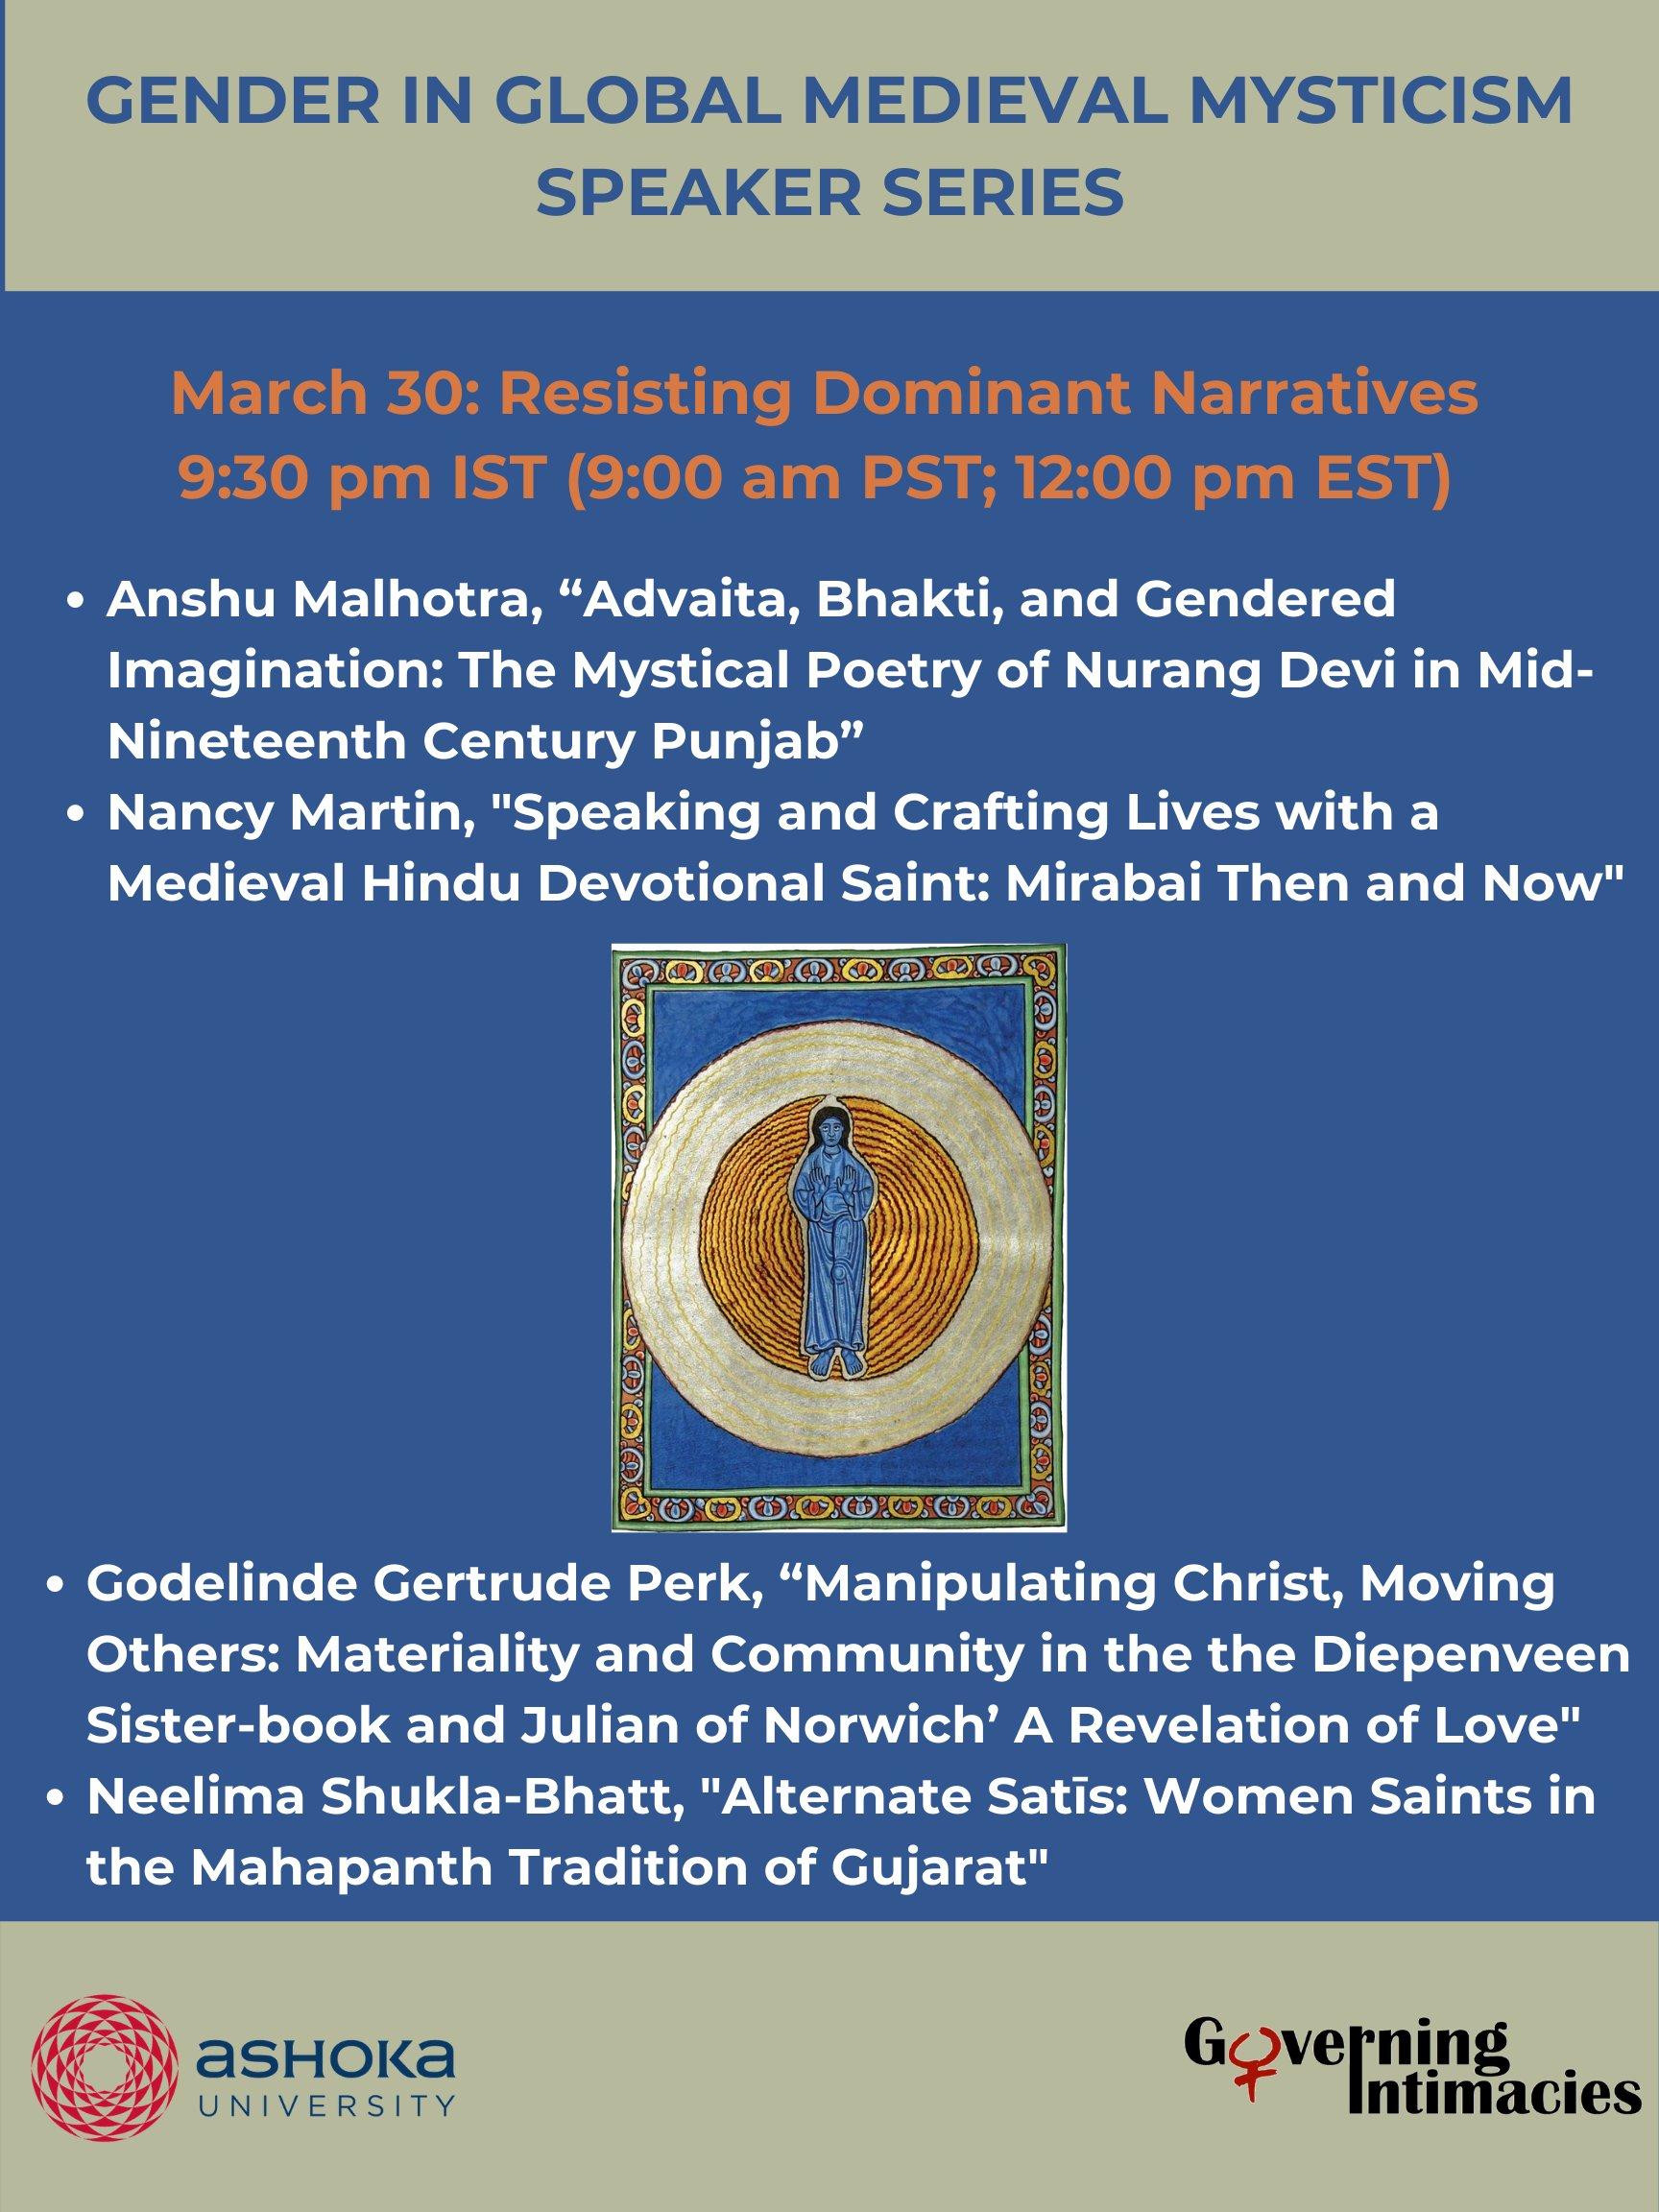 March 30: Resisting Dominant Narratives 12:00pm EST; 9:00am PST